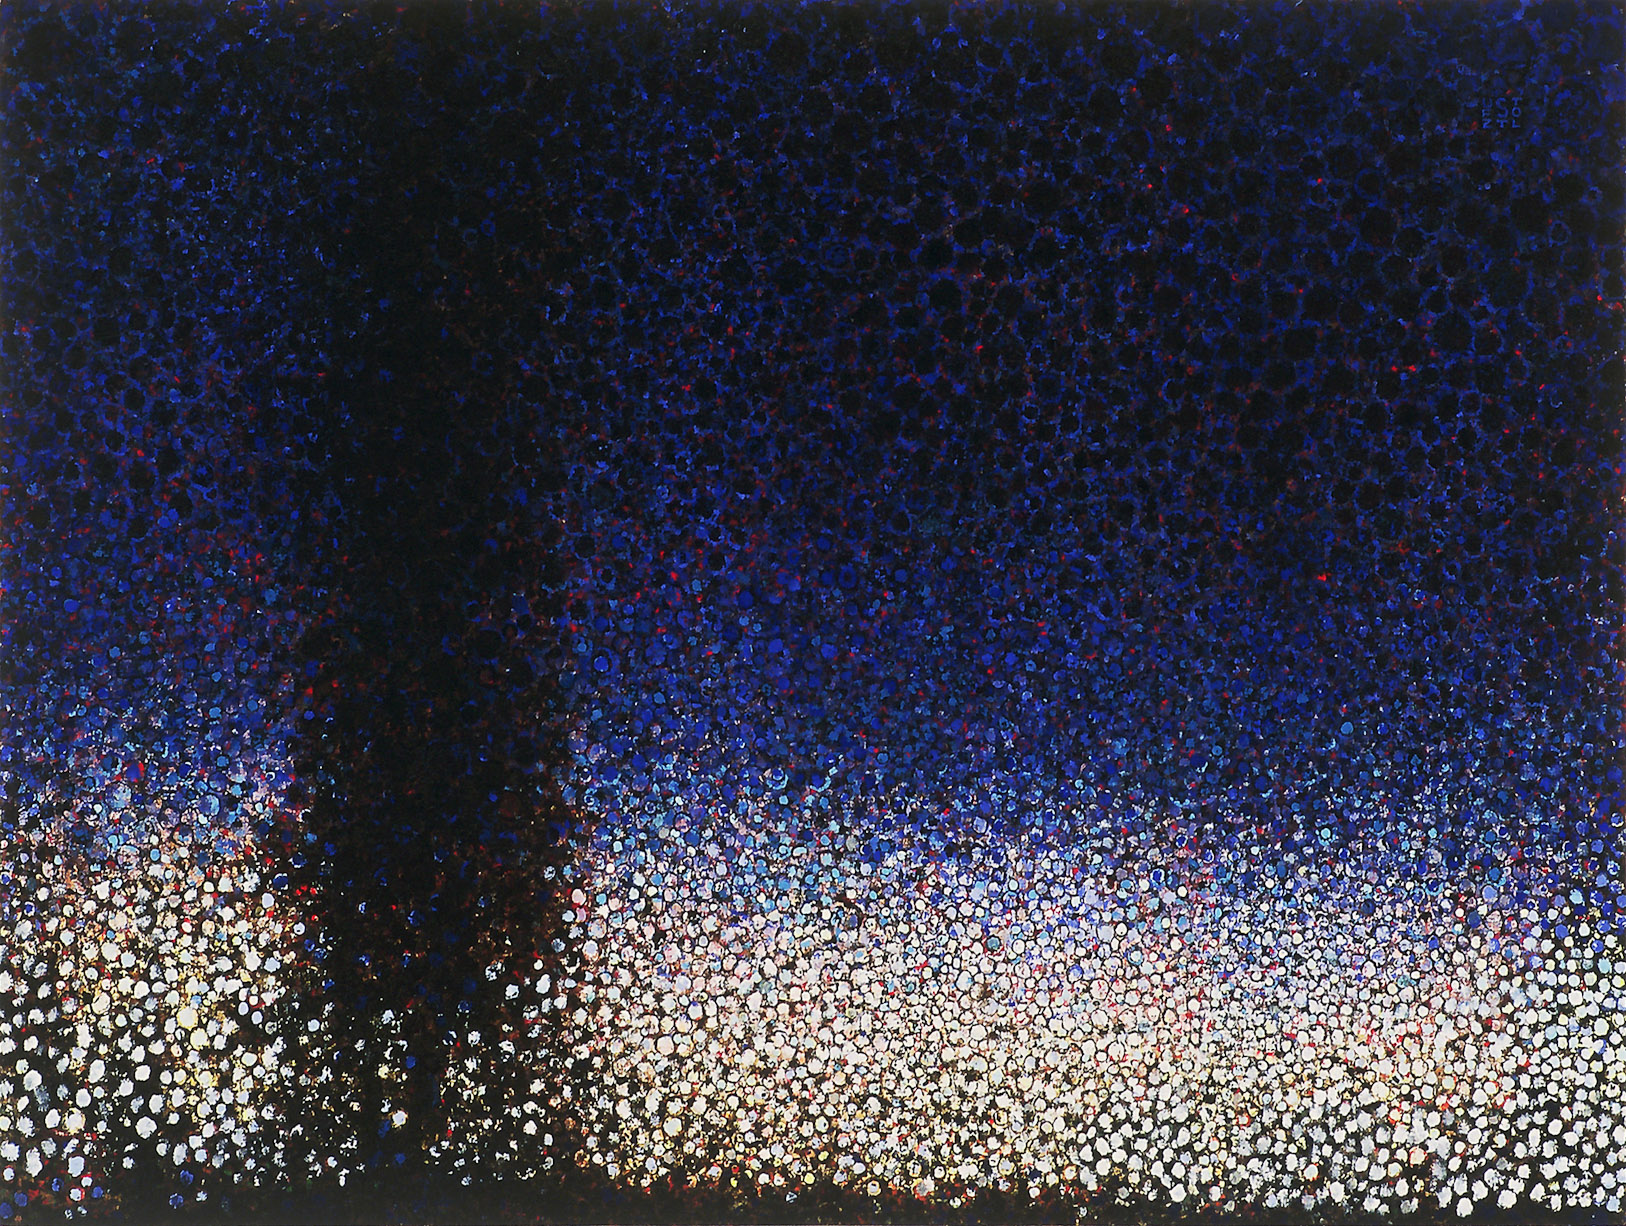 Half light by Randall Stoltzfus